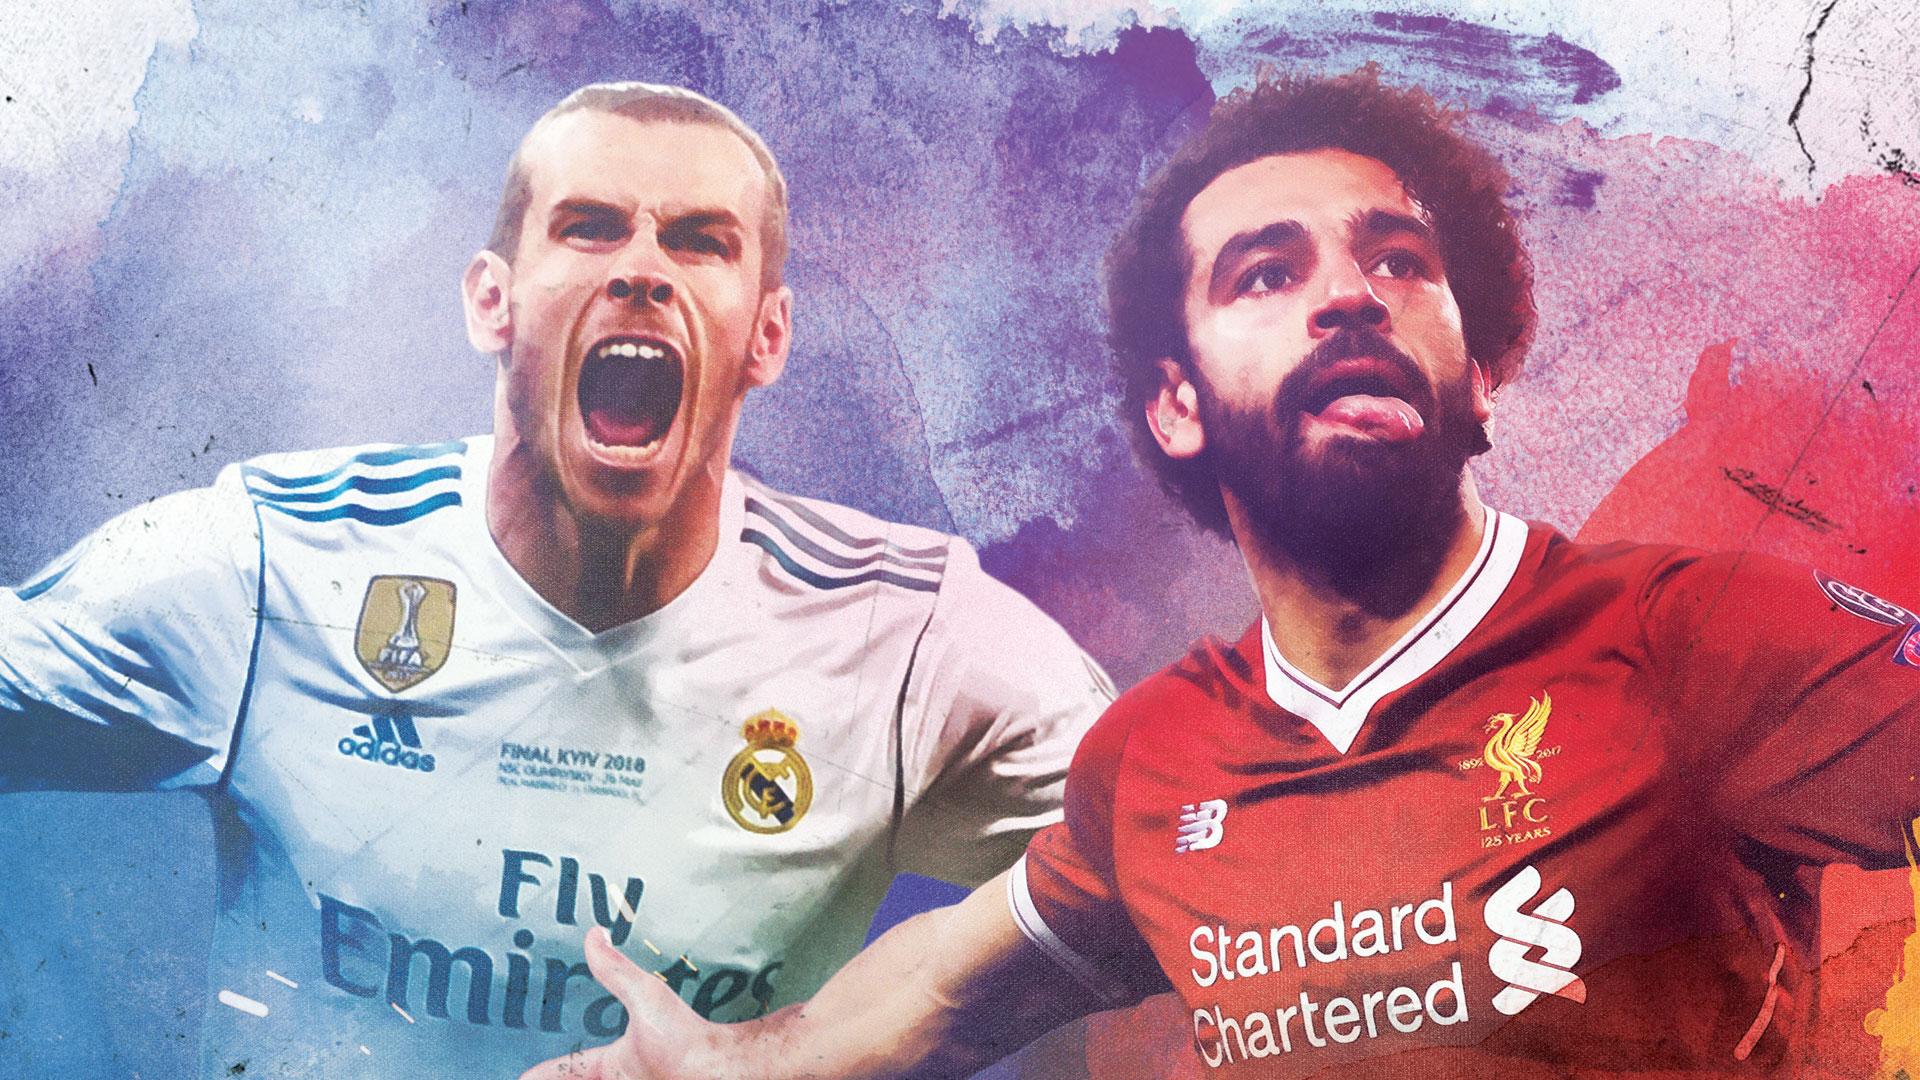 Copy of Champions League Superheroes